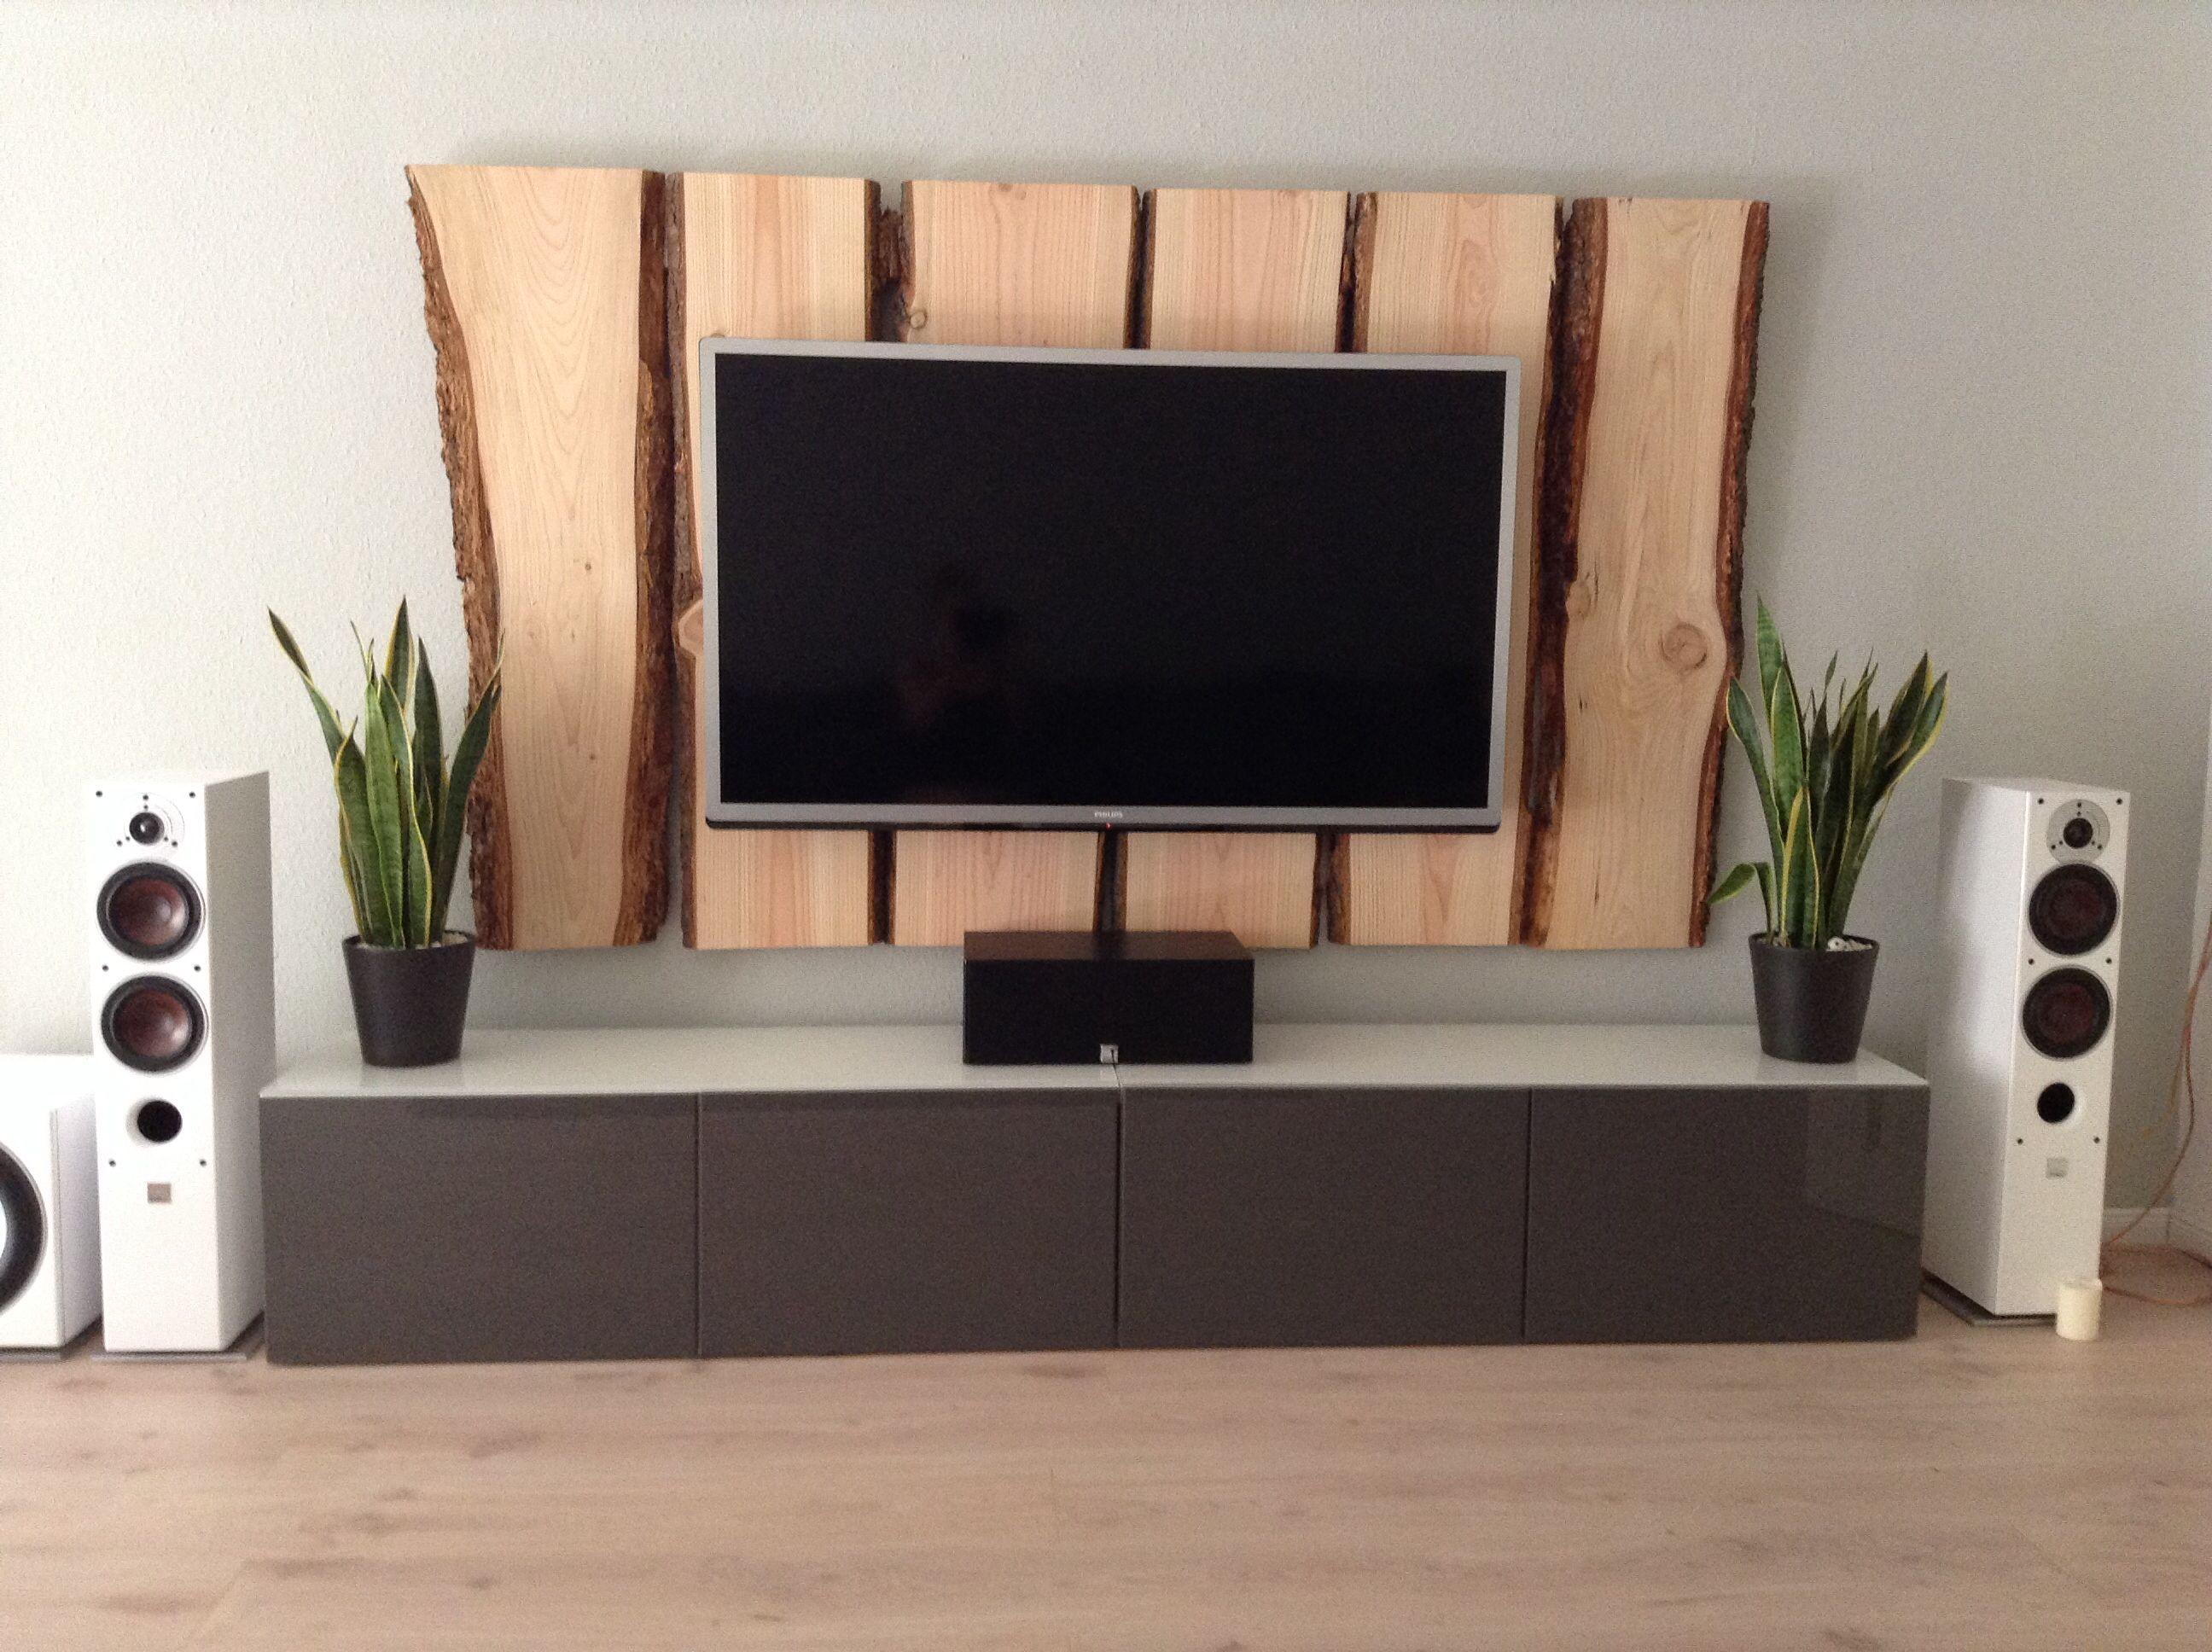 fernsehwand holz : holz tv wand tv wall wood deko und so pinterest 7